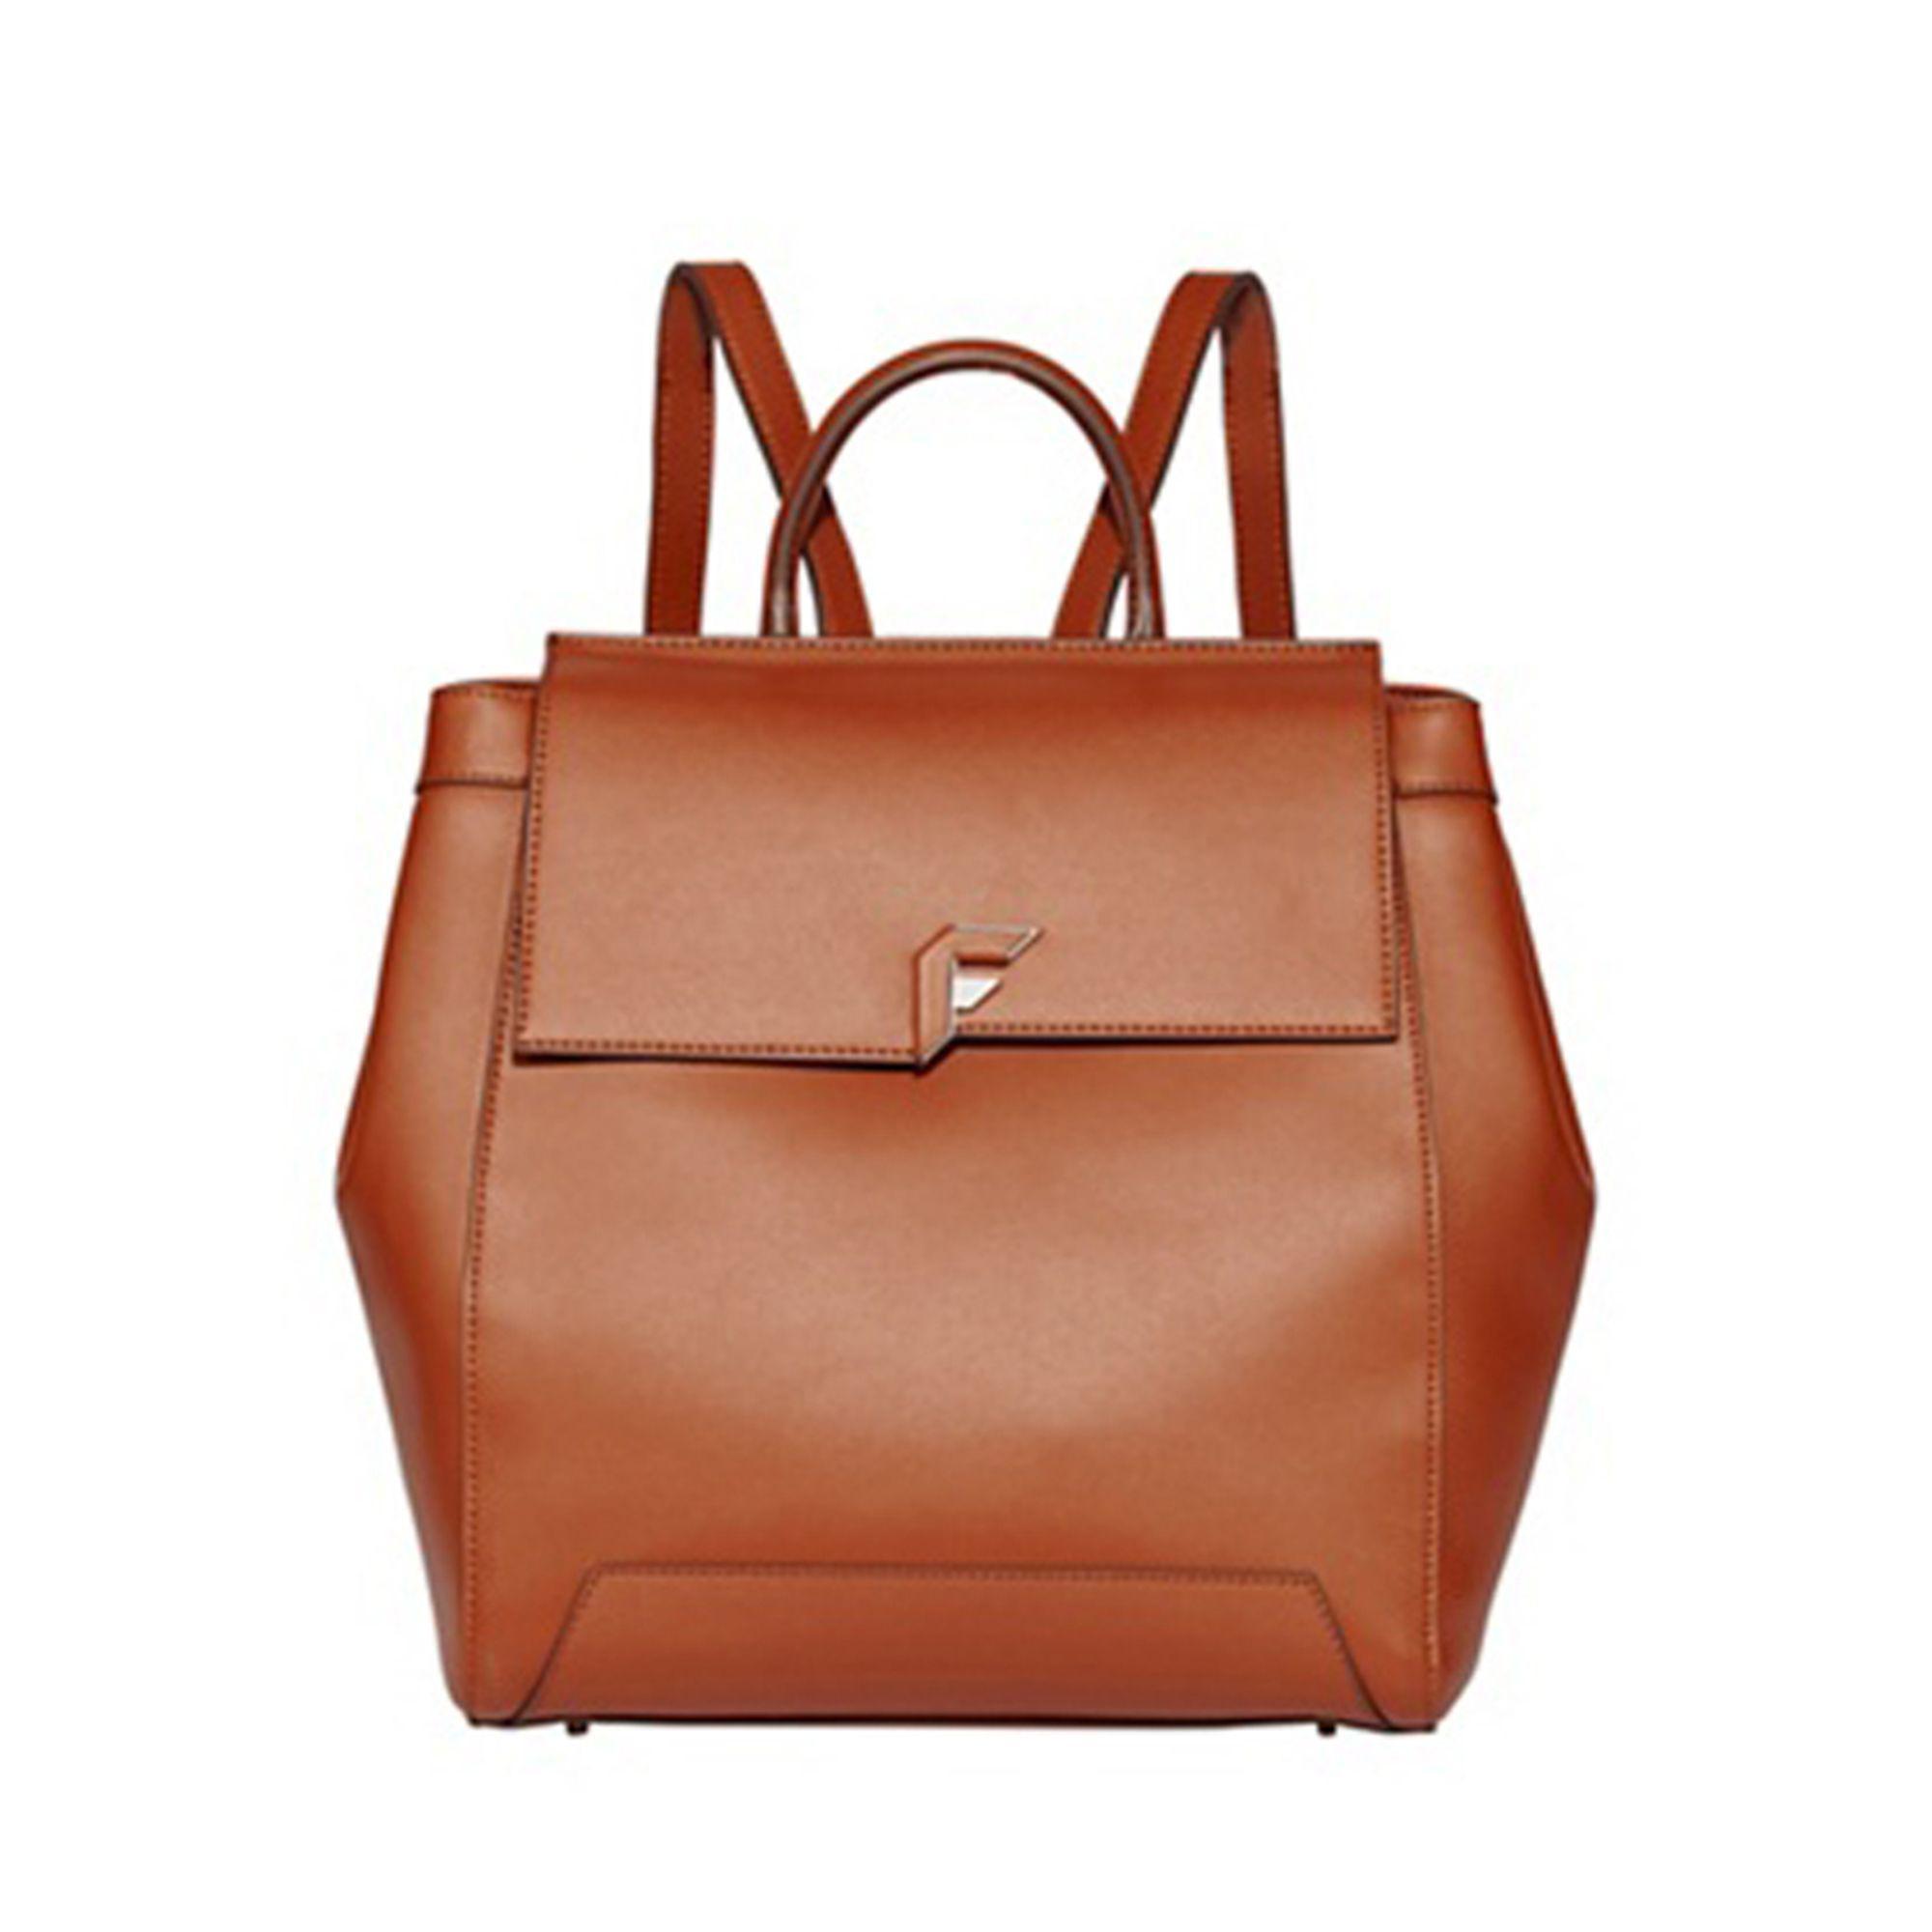 Fiorelli Tan Barrington Backpack in Brown - Lyst